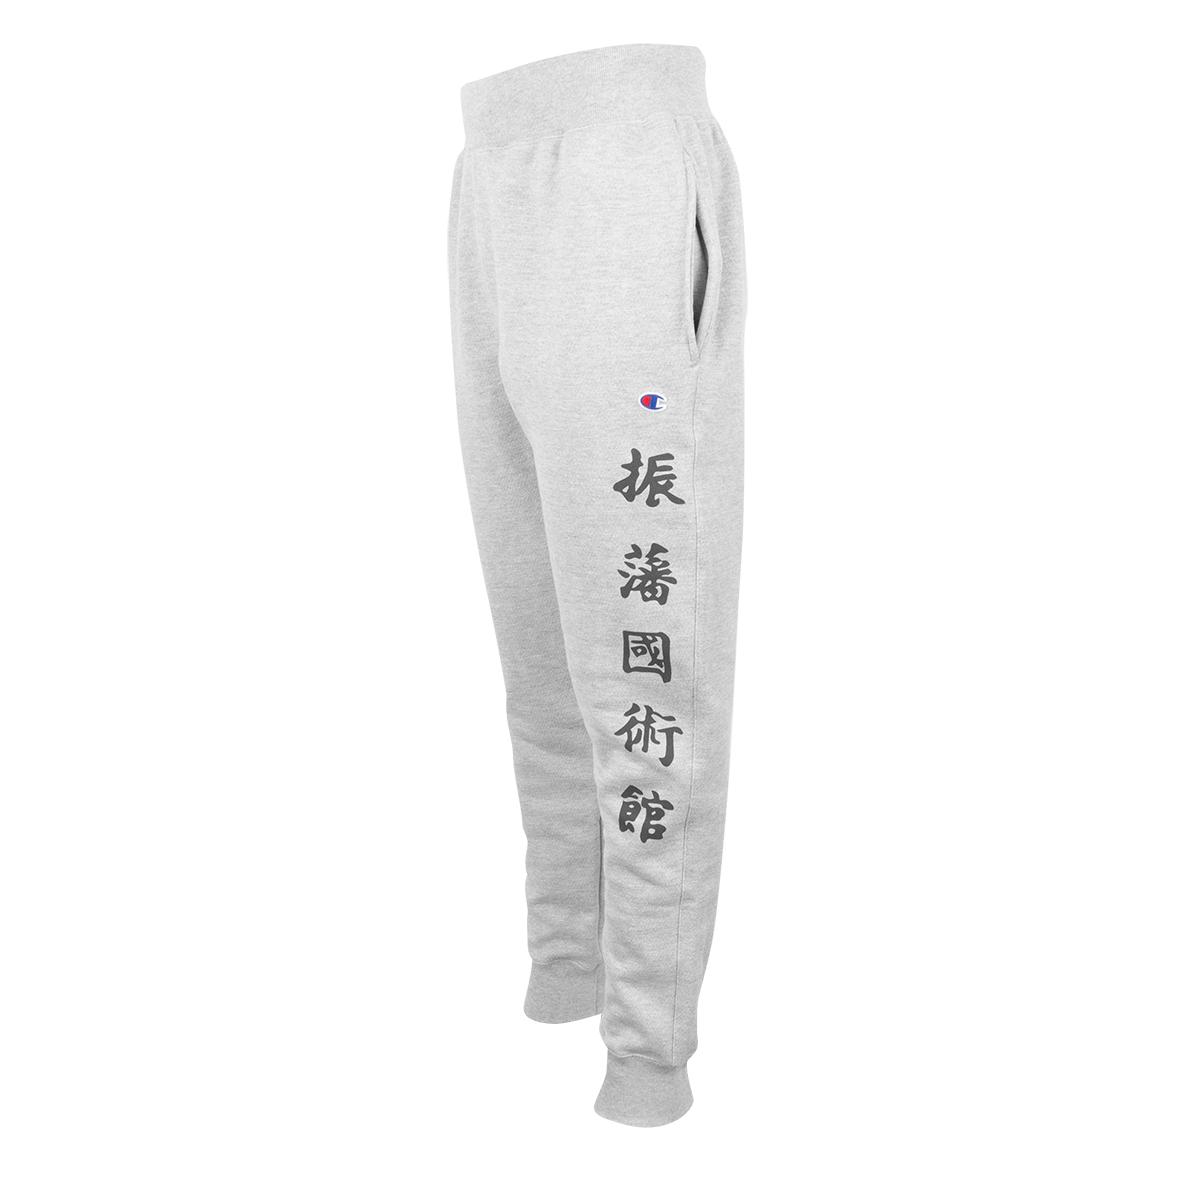 JKD Origins Champion Jogger Pants